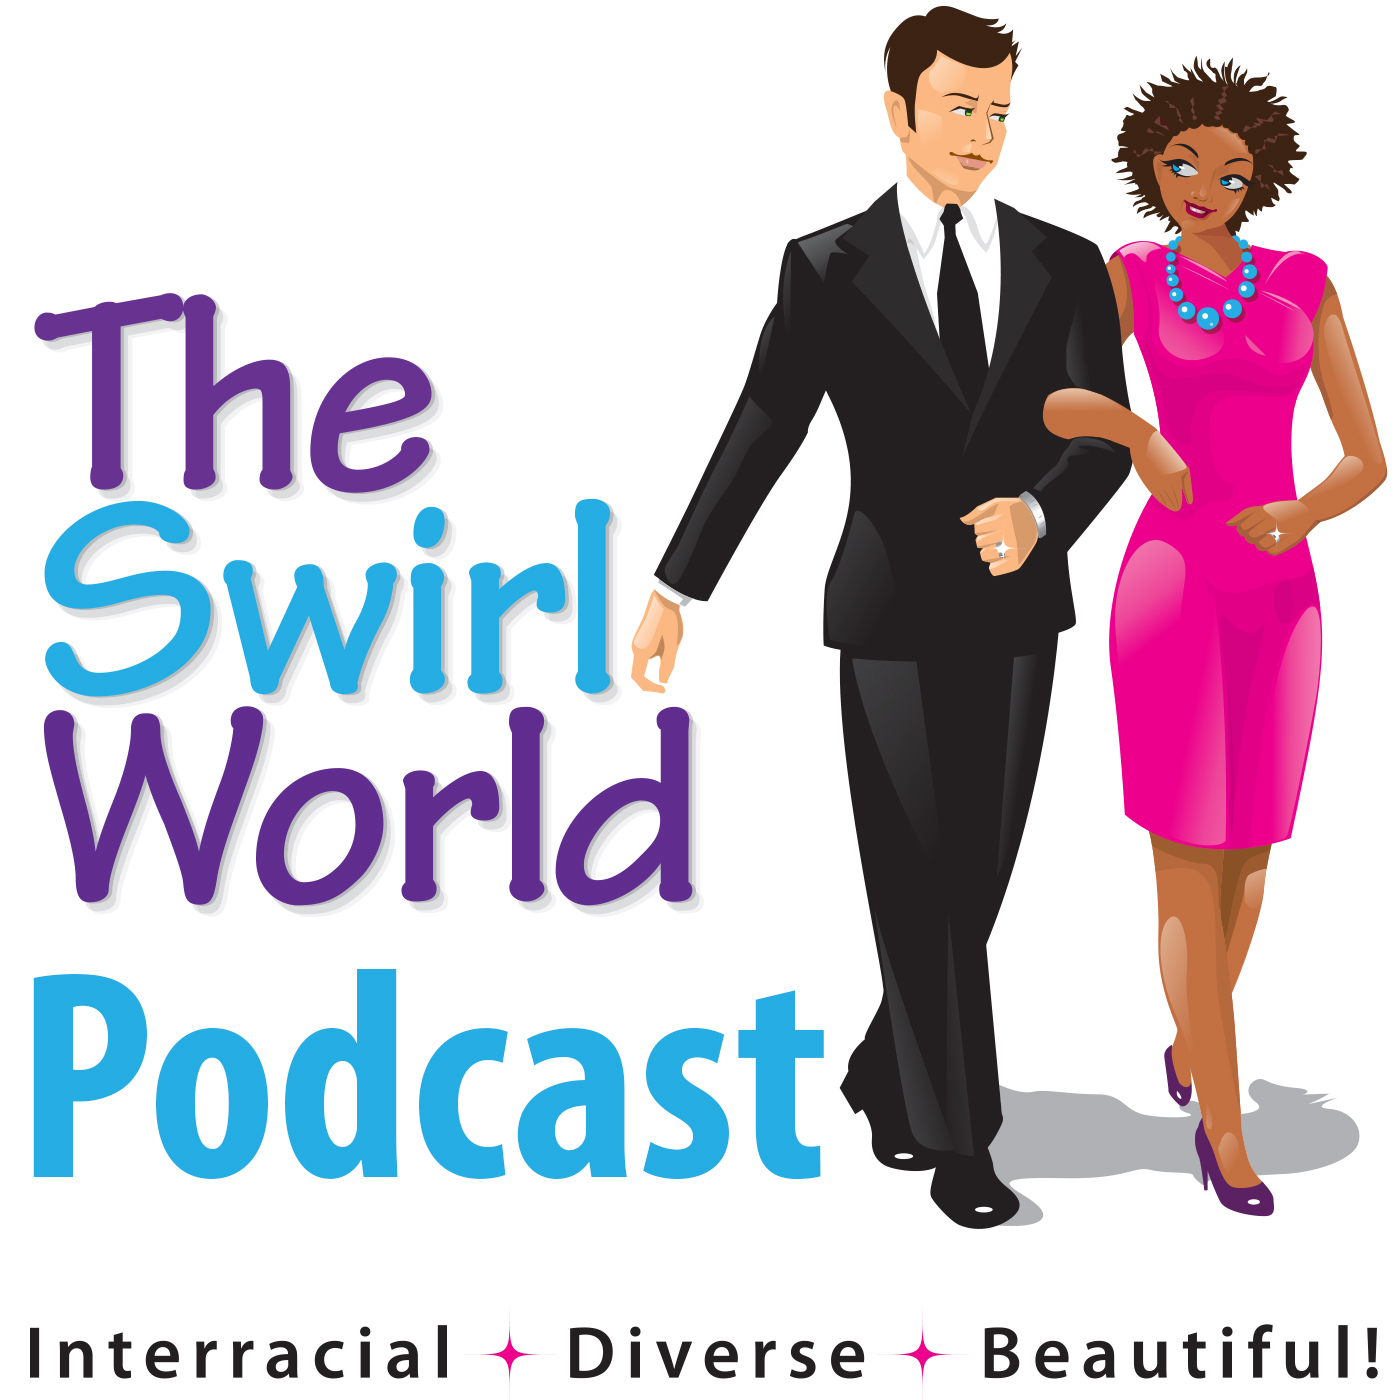 The Swirl World Podcast logo